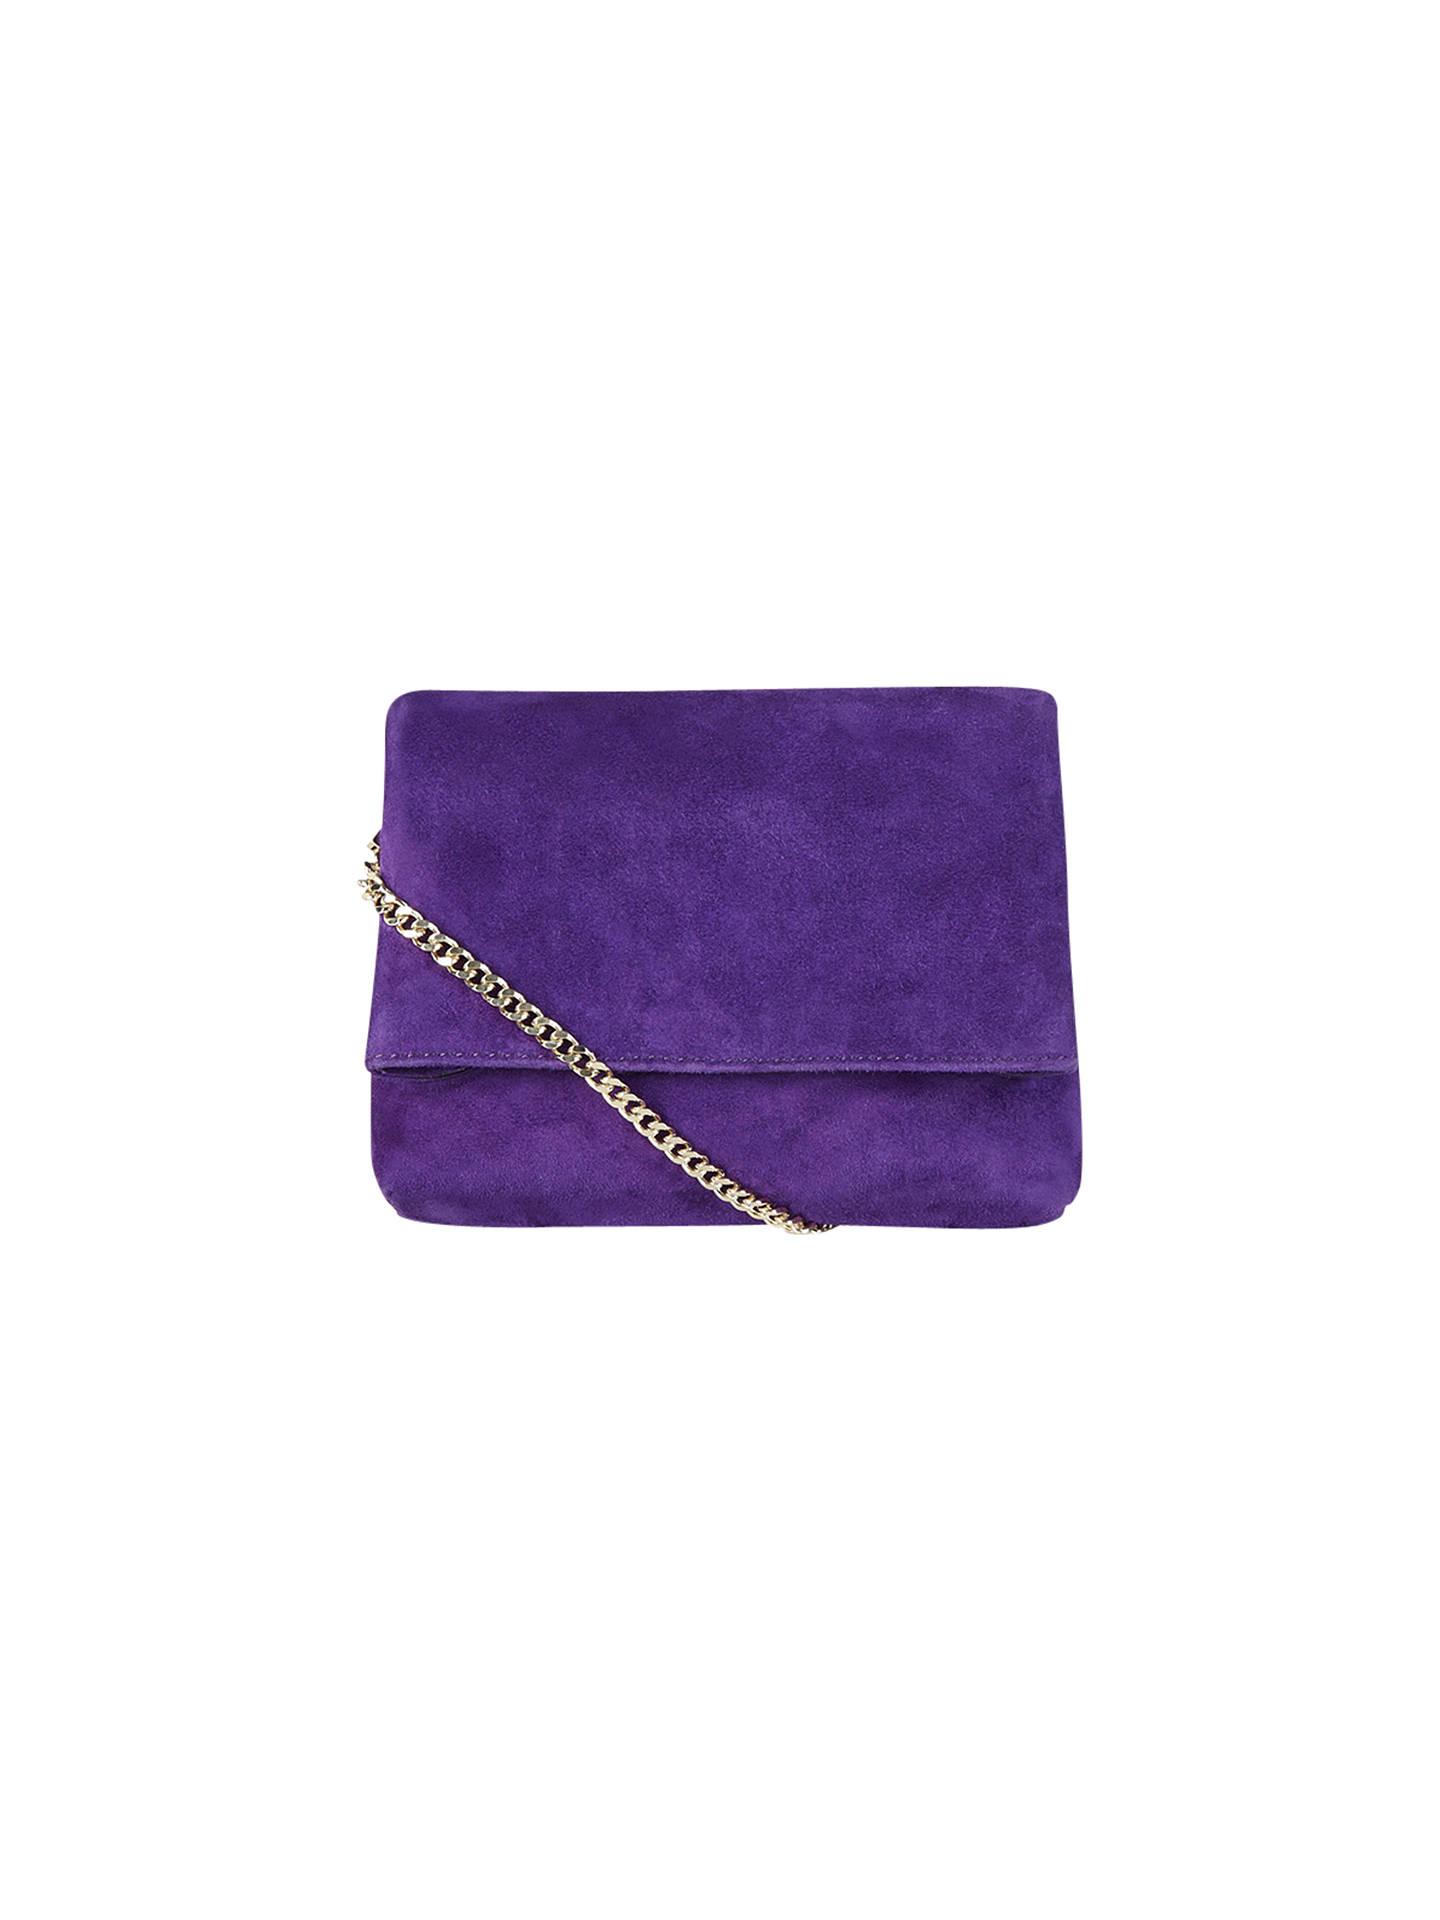 9fe1d5a32b1 Buy Karen Millen Aldwych Mini Clutch Bag, Purple Online at johnlewis.com ...